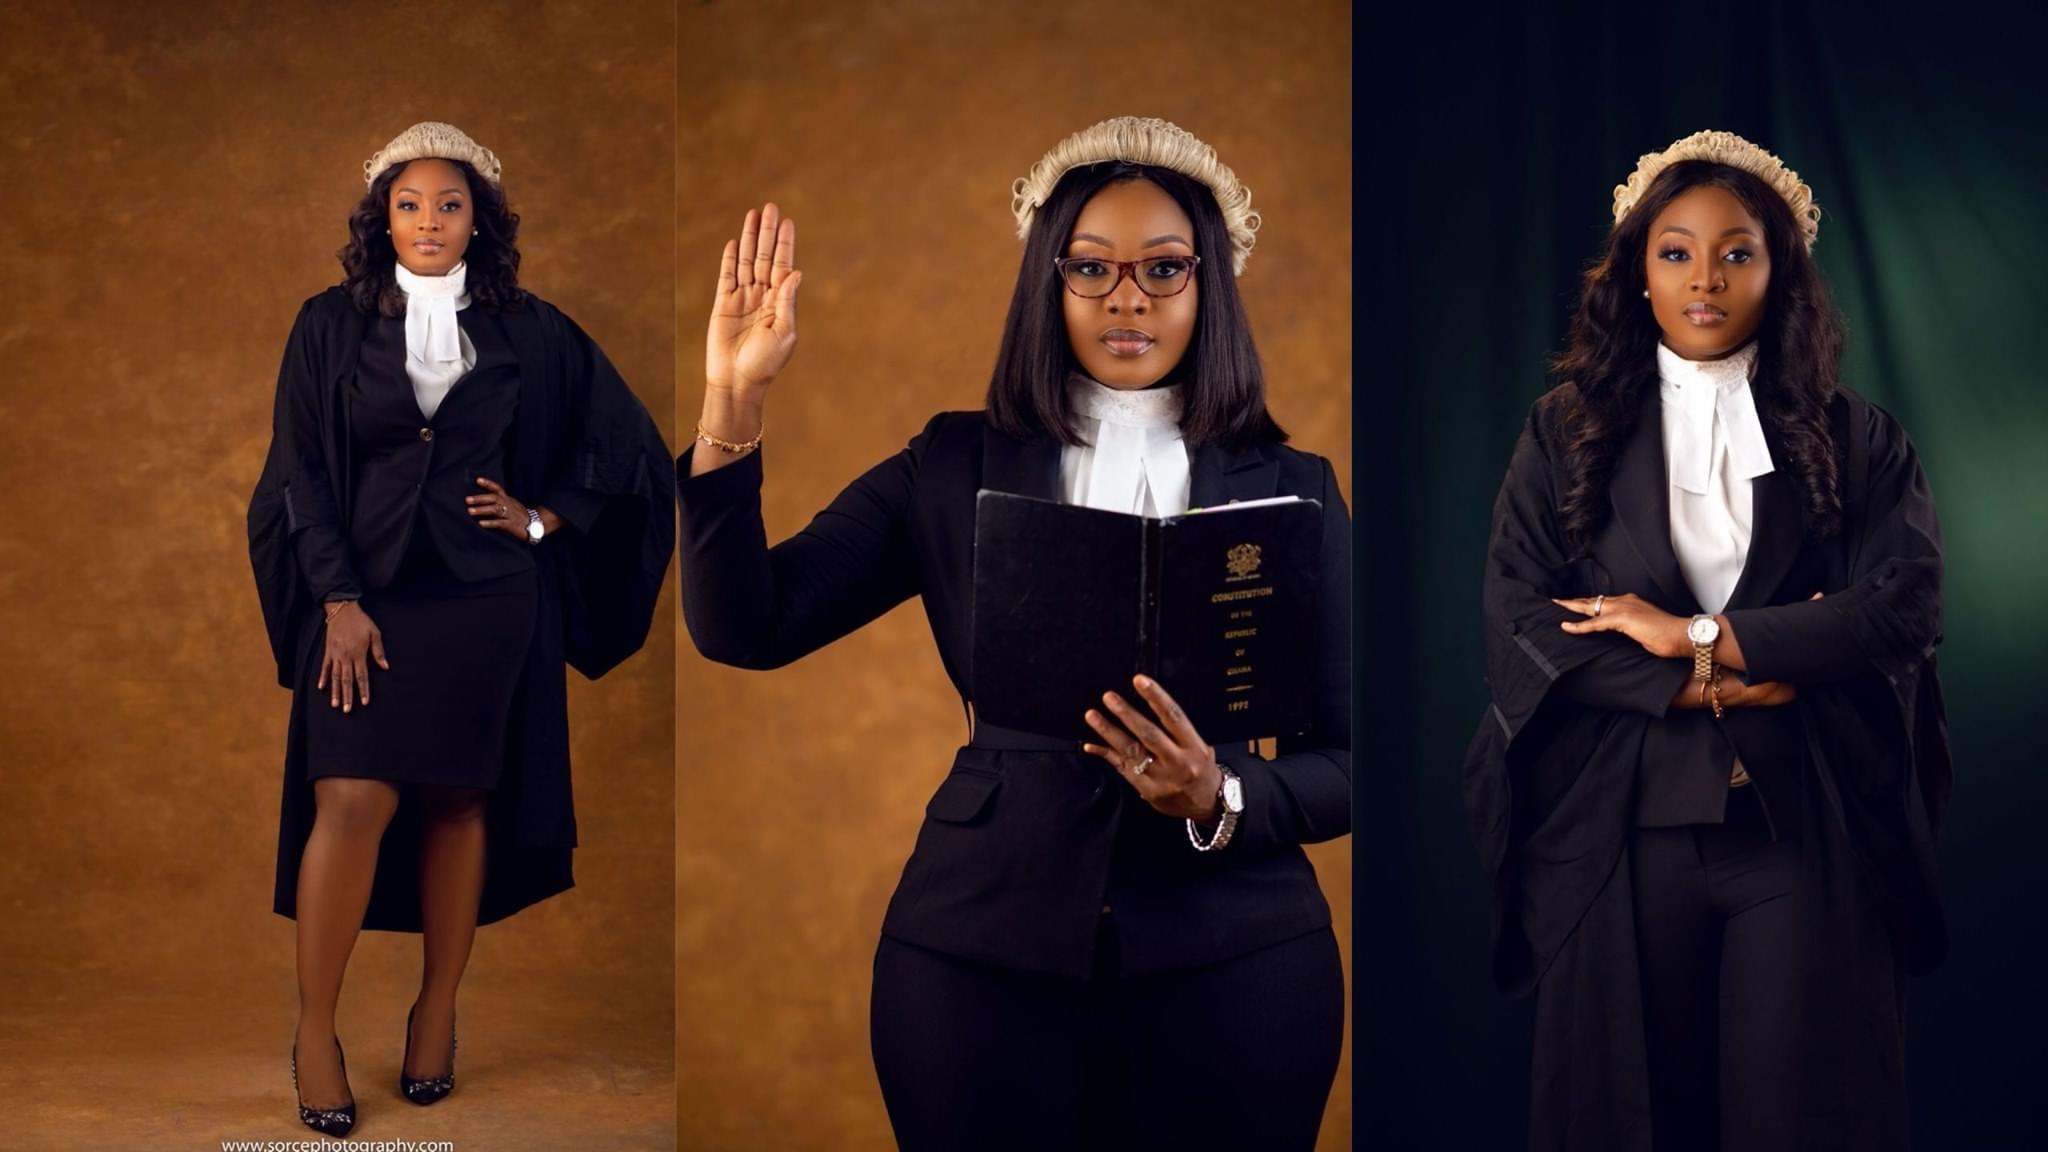 From Economist To Lawyer, Meet Marylove Opoku-Mensah Otoo